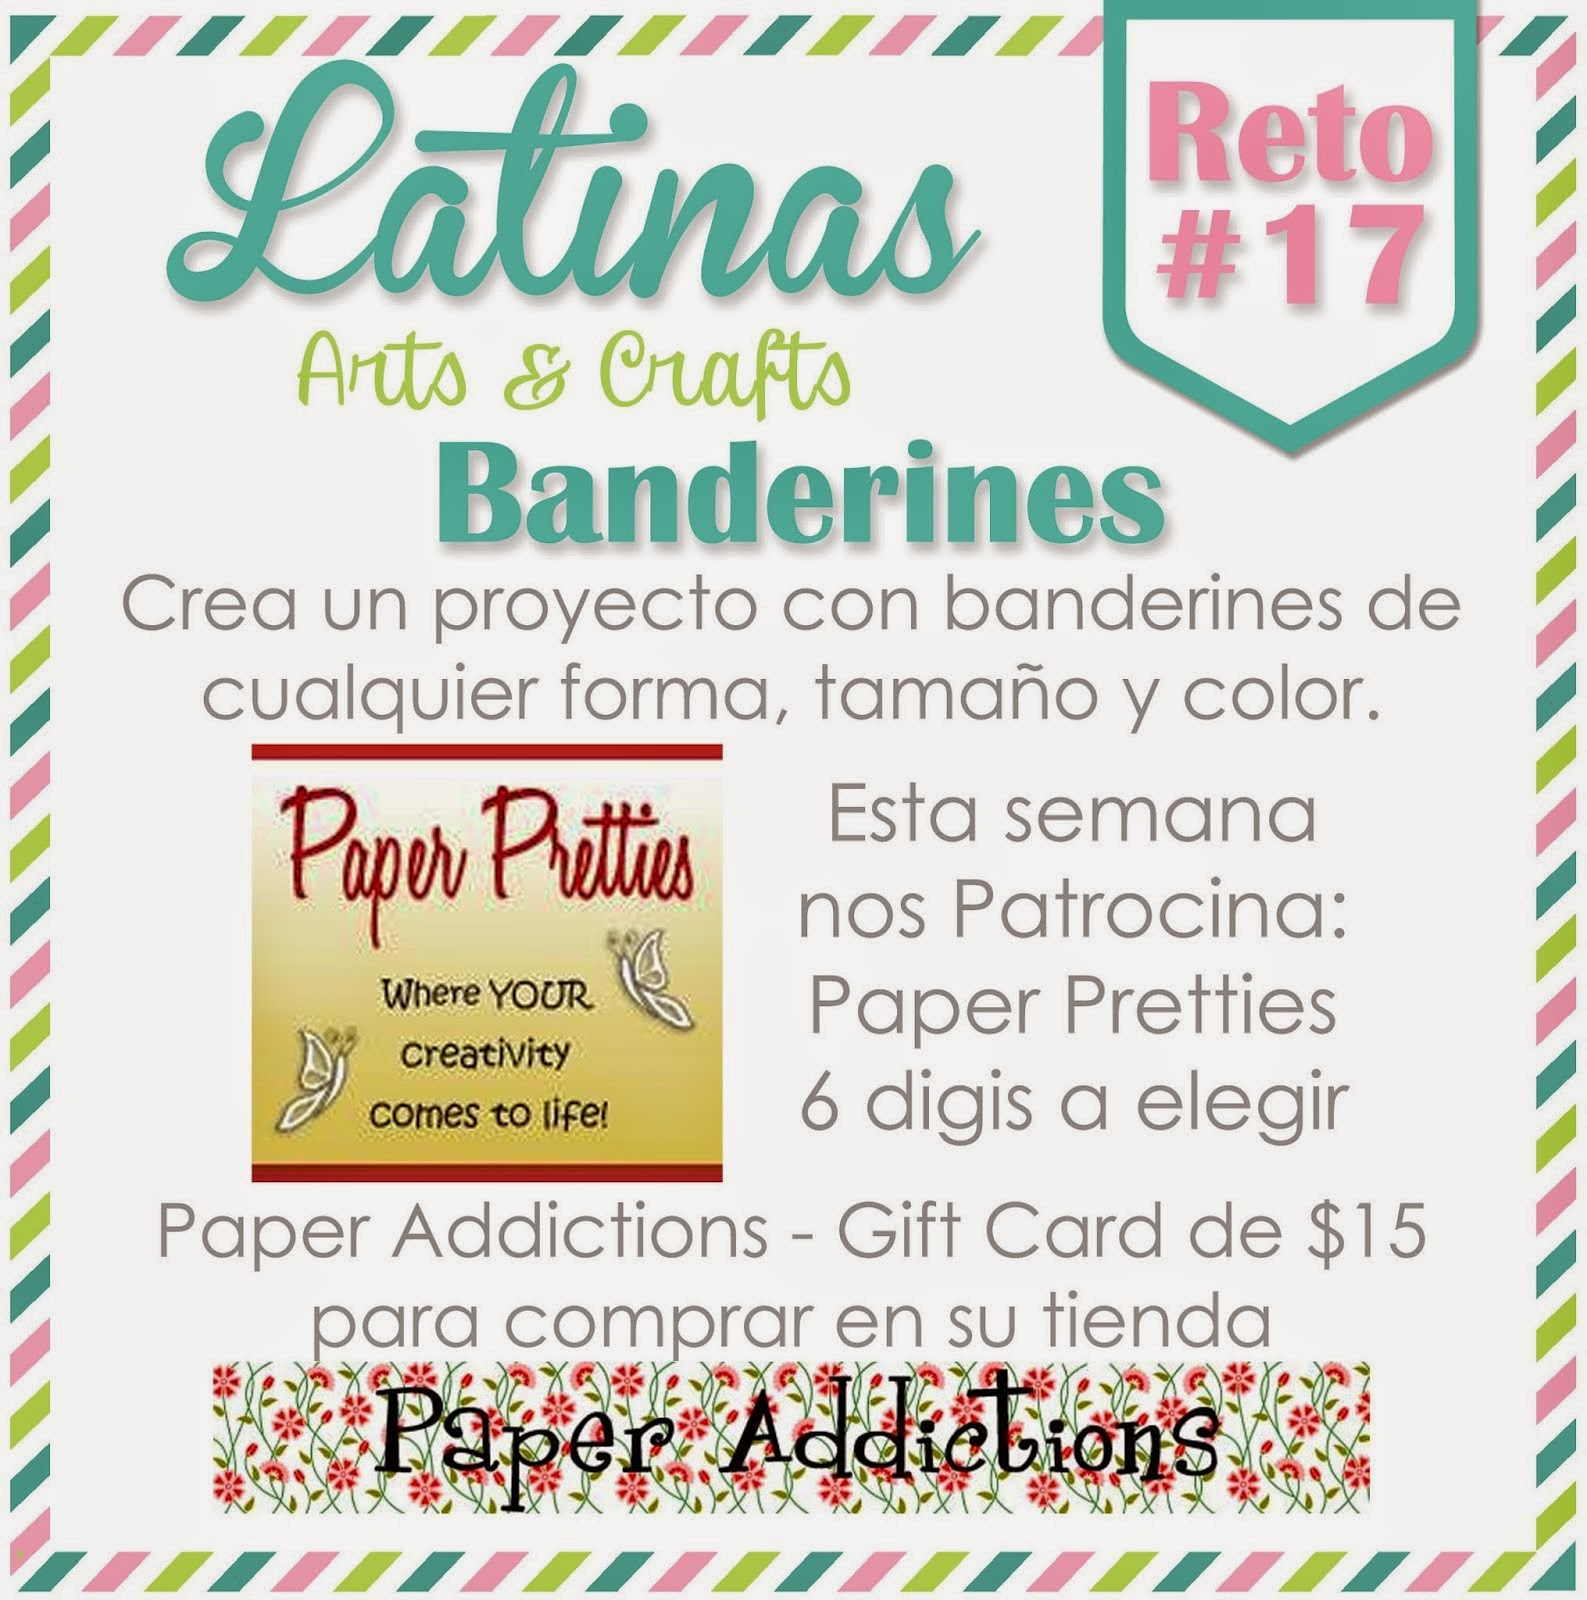 http://1.bp.blogspot.com/-Fk9DvSQ44Vo/U_03gVbLGxI/AAAAAAAABxg/jQvgr9teudo/s1600/Reto-17-Latinas-Arts-And-Crafts.jpg